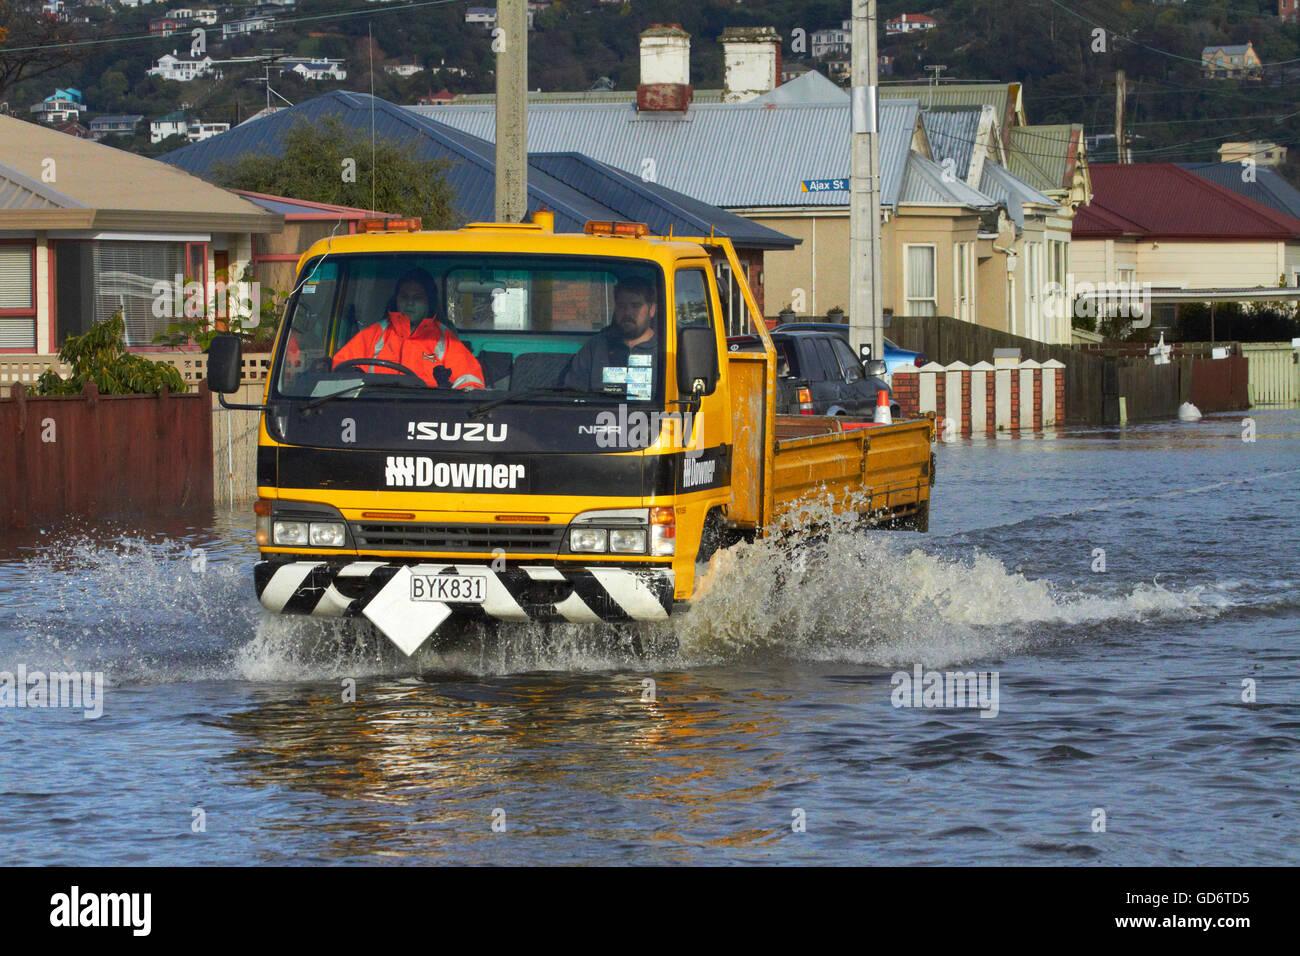 Truck on flooded Bay View Road, South Dunedin floods, Dunedin, South Island, New Zealand Stock Photo